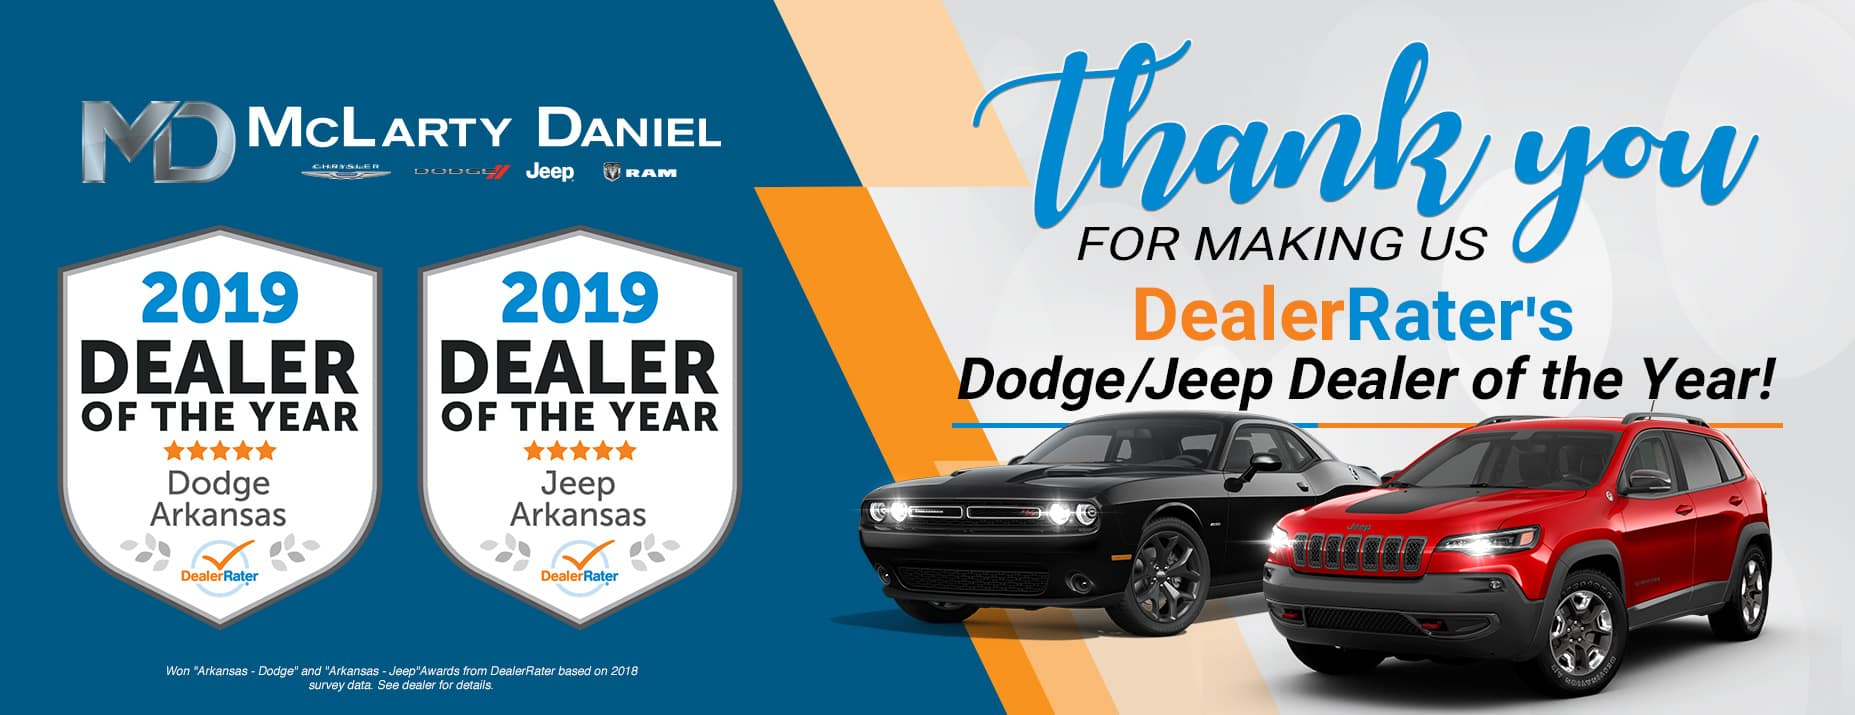 Dodge Dealers In Md >> Mclarty Daniel Chrysler Dodge Jeep Ram Cdjr Dealer In